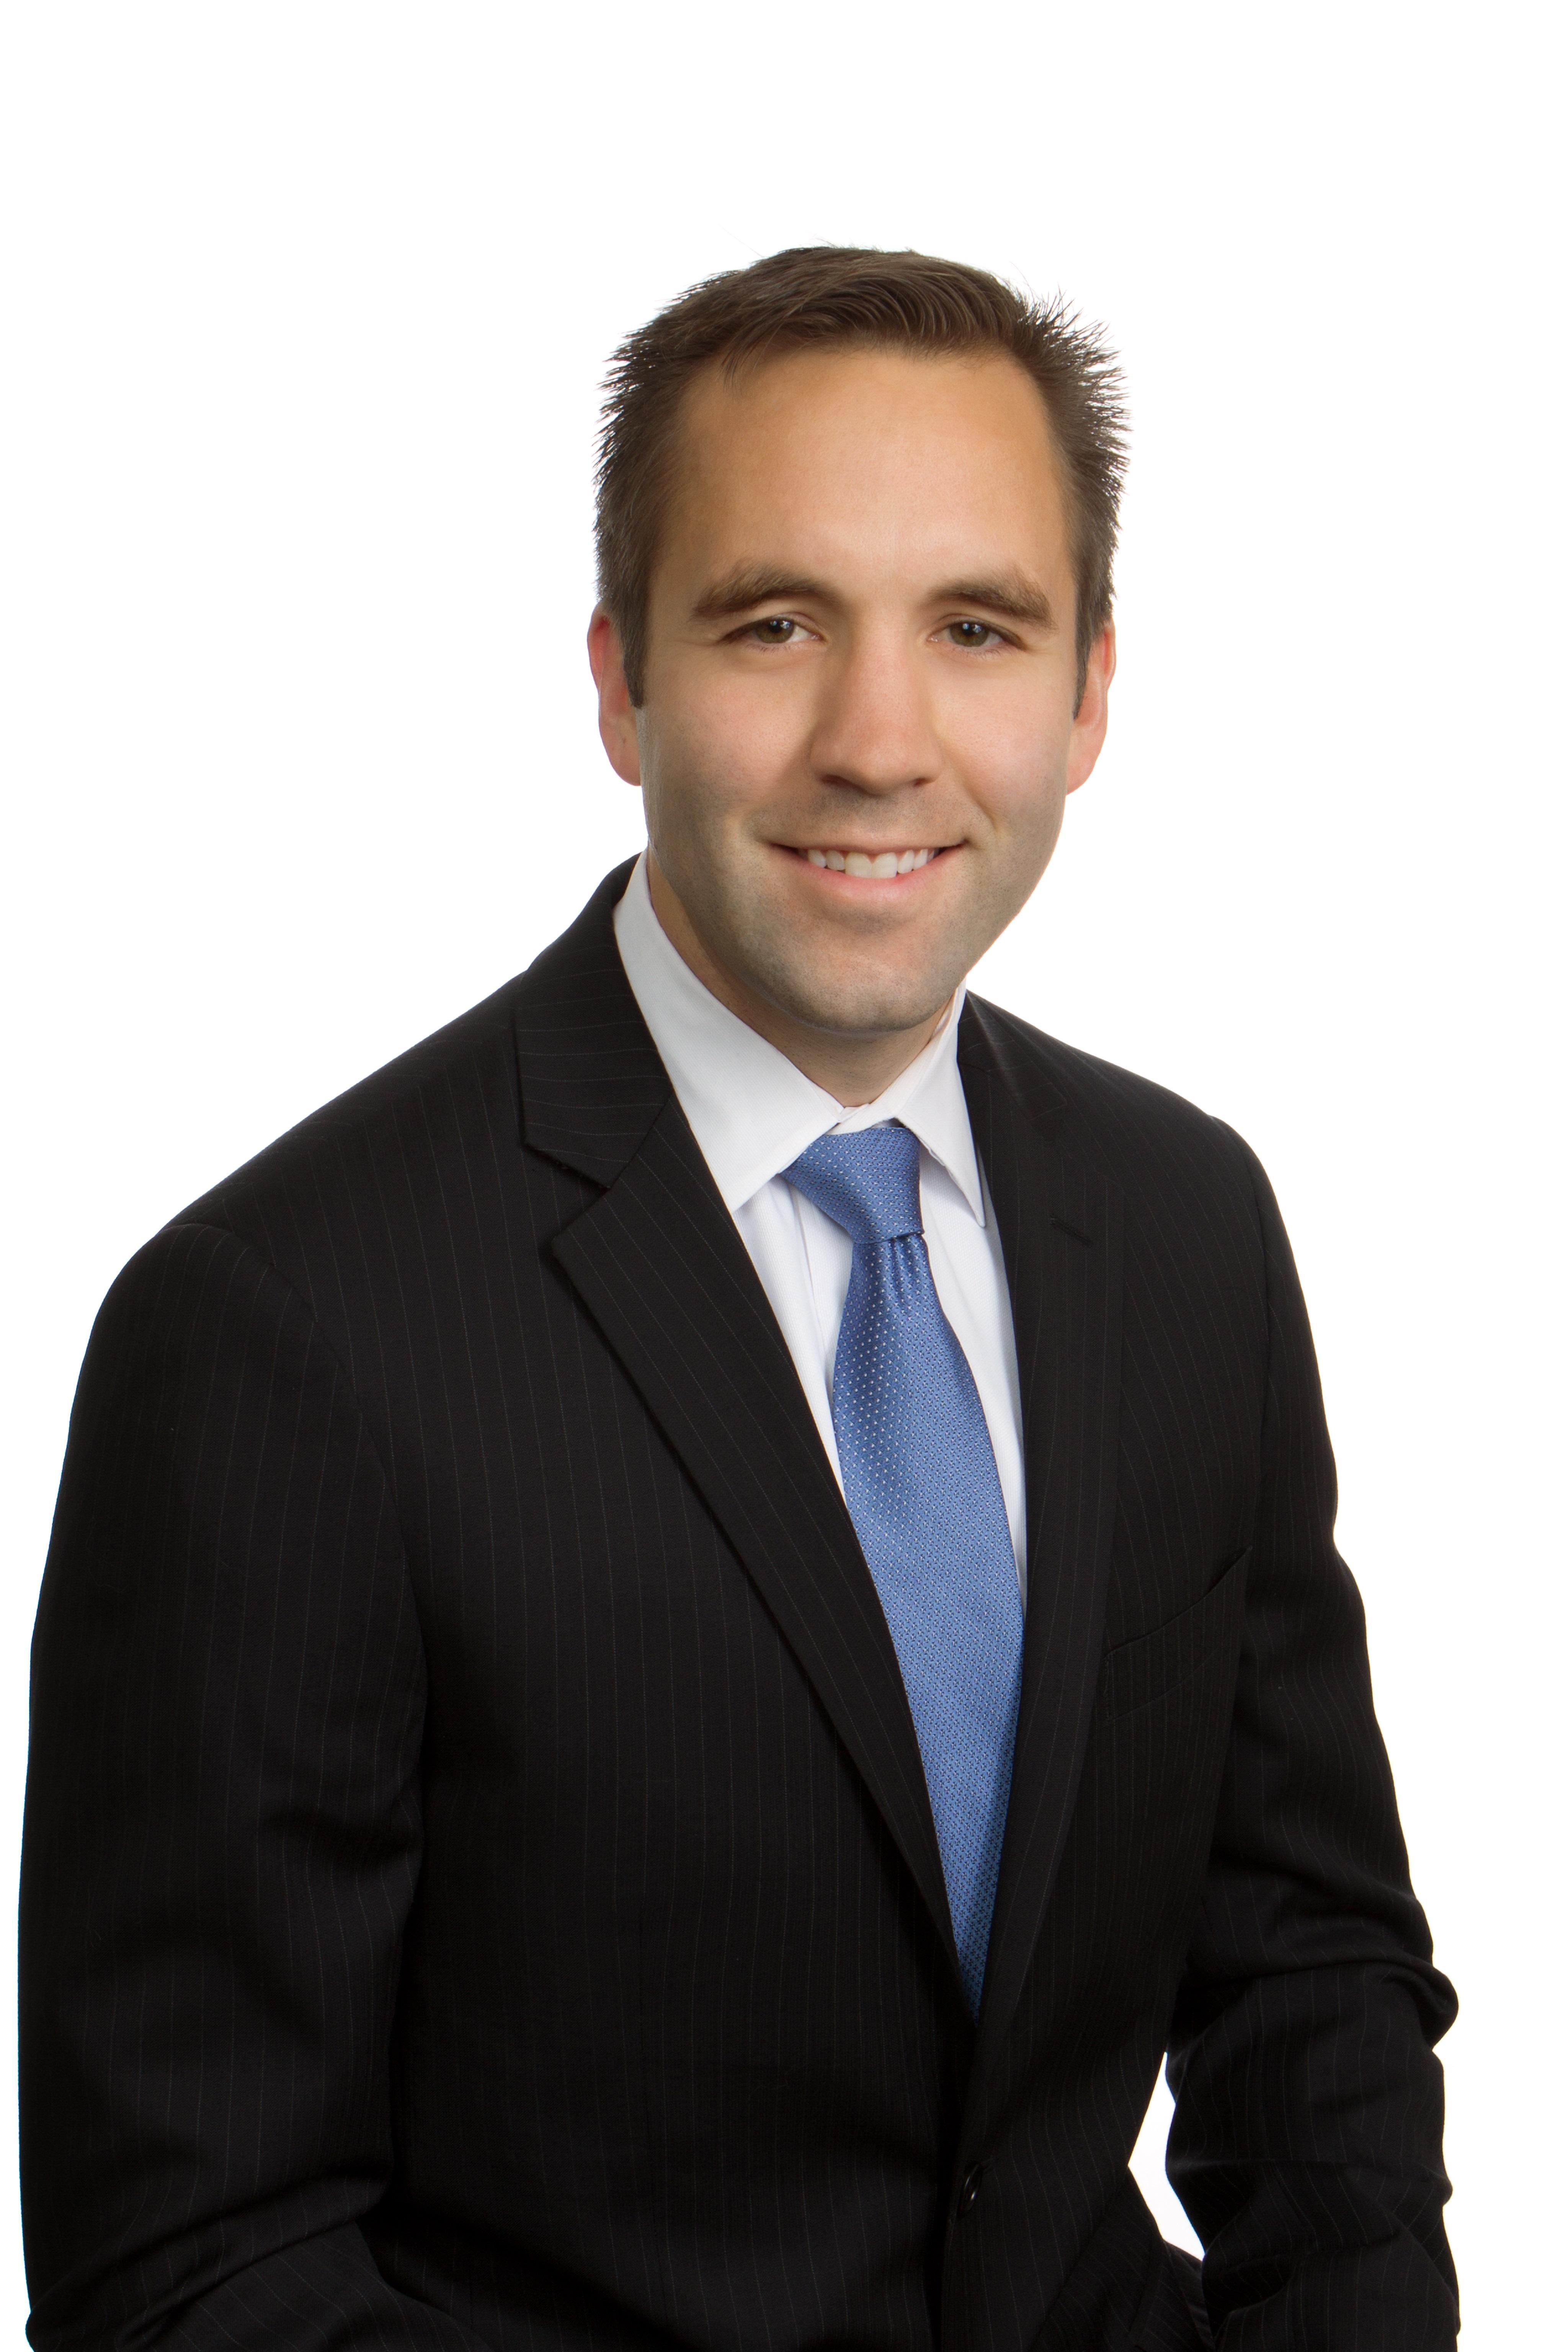 Mark Oakes (Panelist)